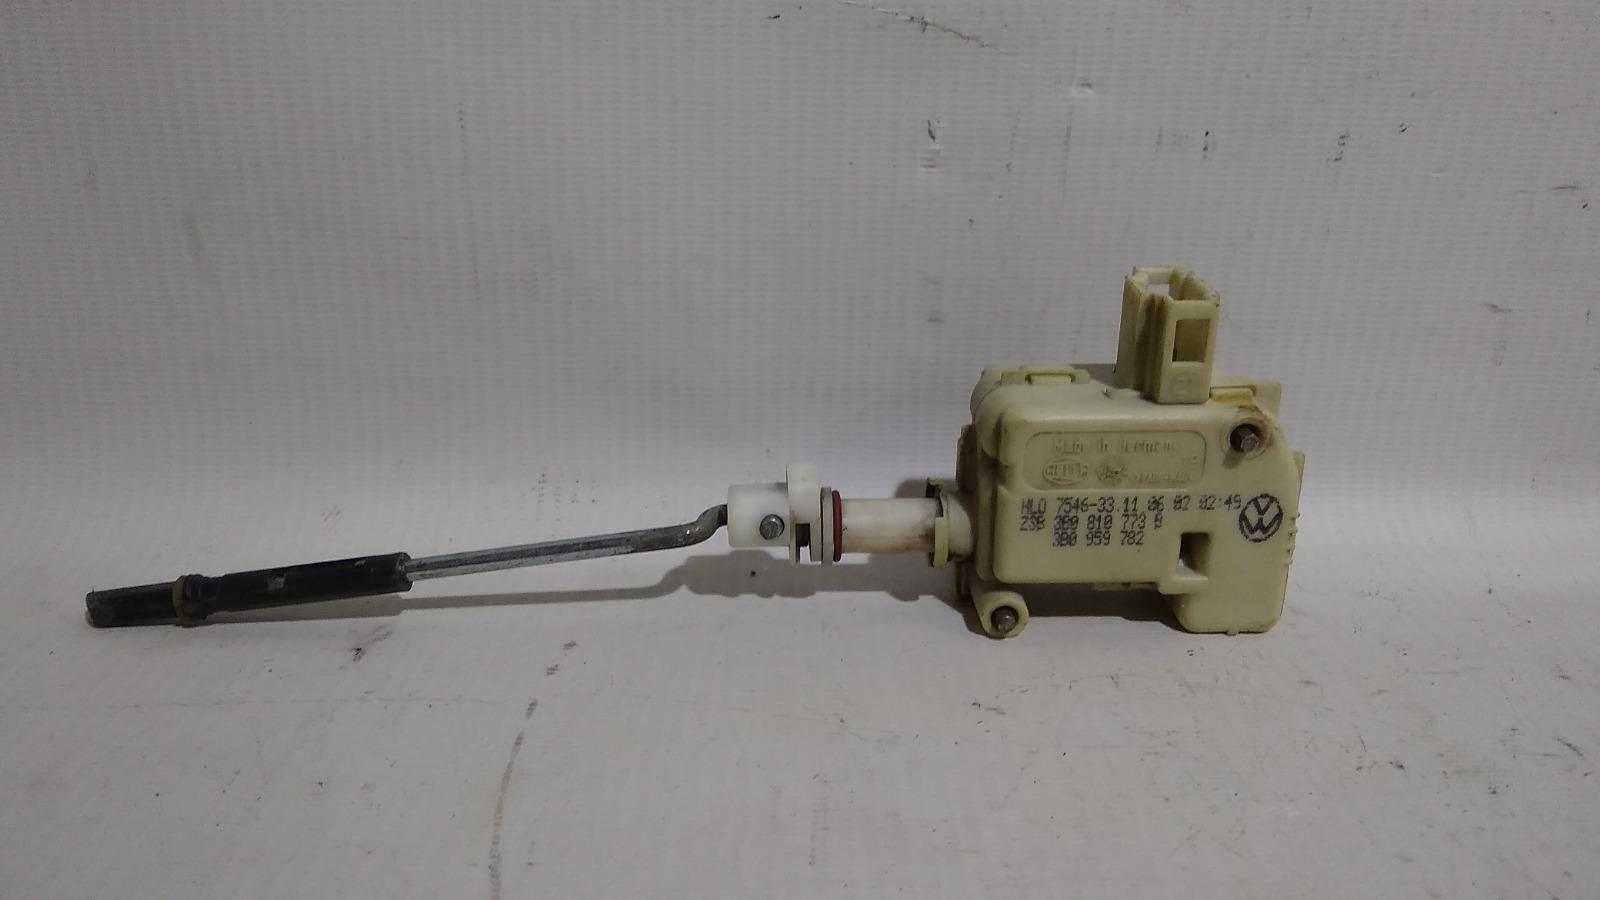 Активатор замка крышки бензобака Skoda Octavia (A4 1U-) 1U2 BCA 1997